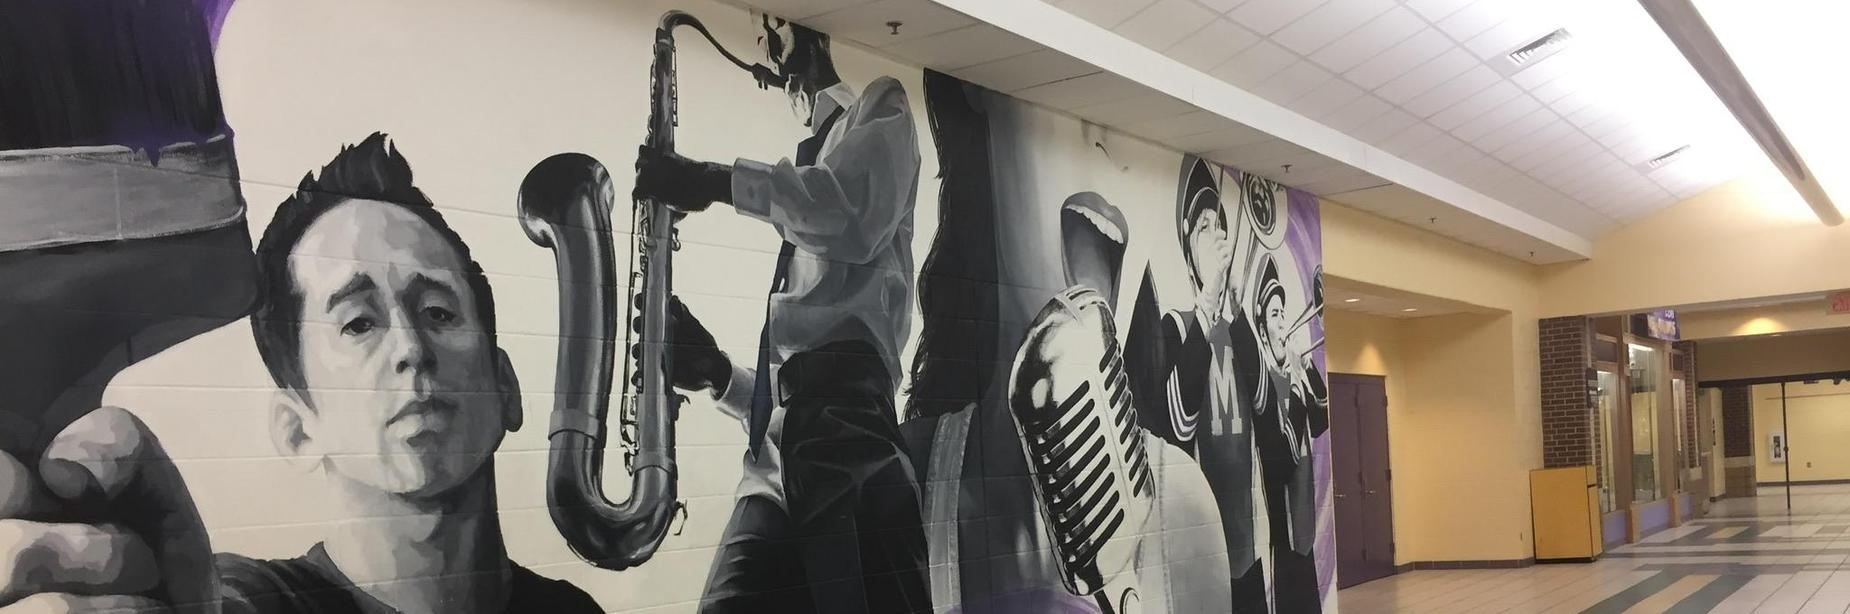 mhs fine arts mural